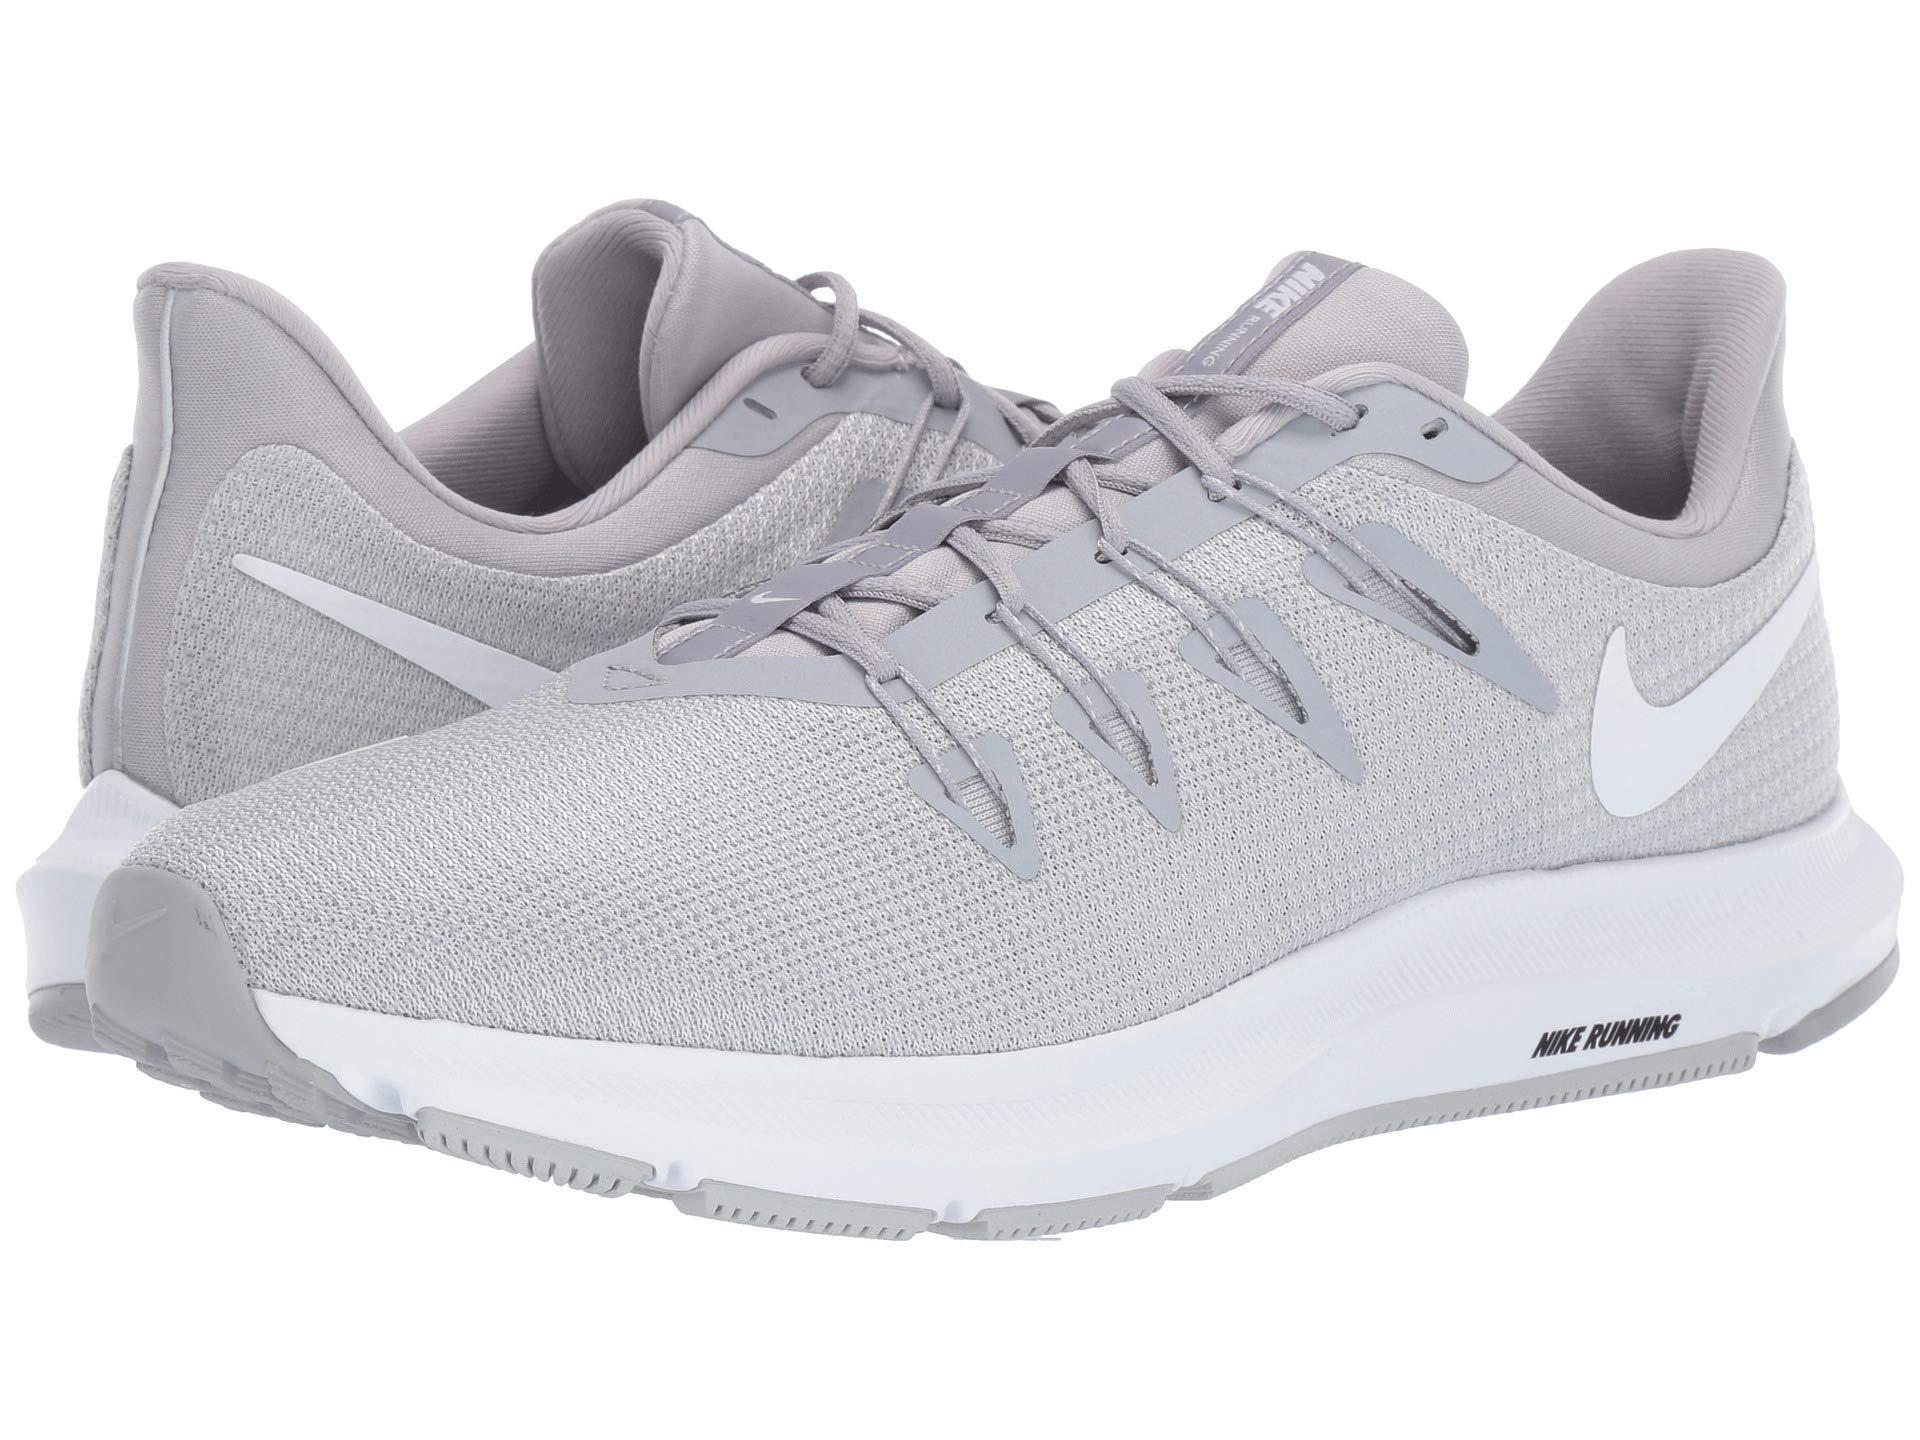 0ad907f39ec32 Lyst - Nike Quest (cool Grey lime Blast black white) Men s Running ...